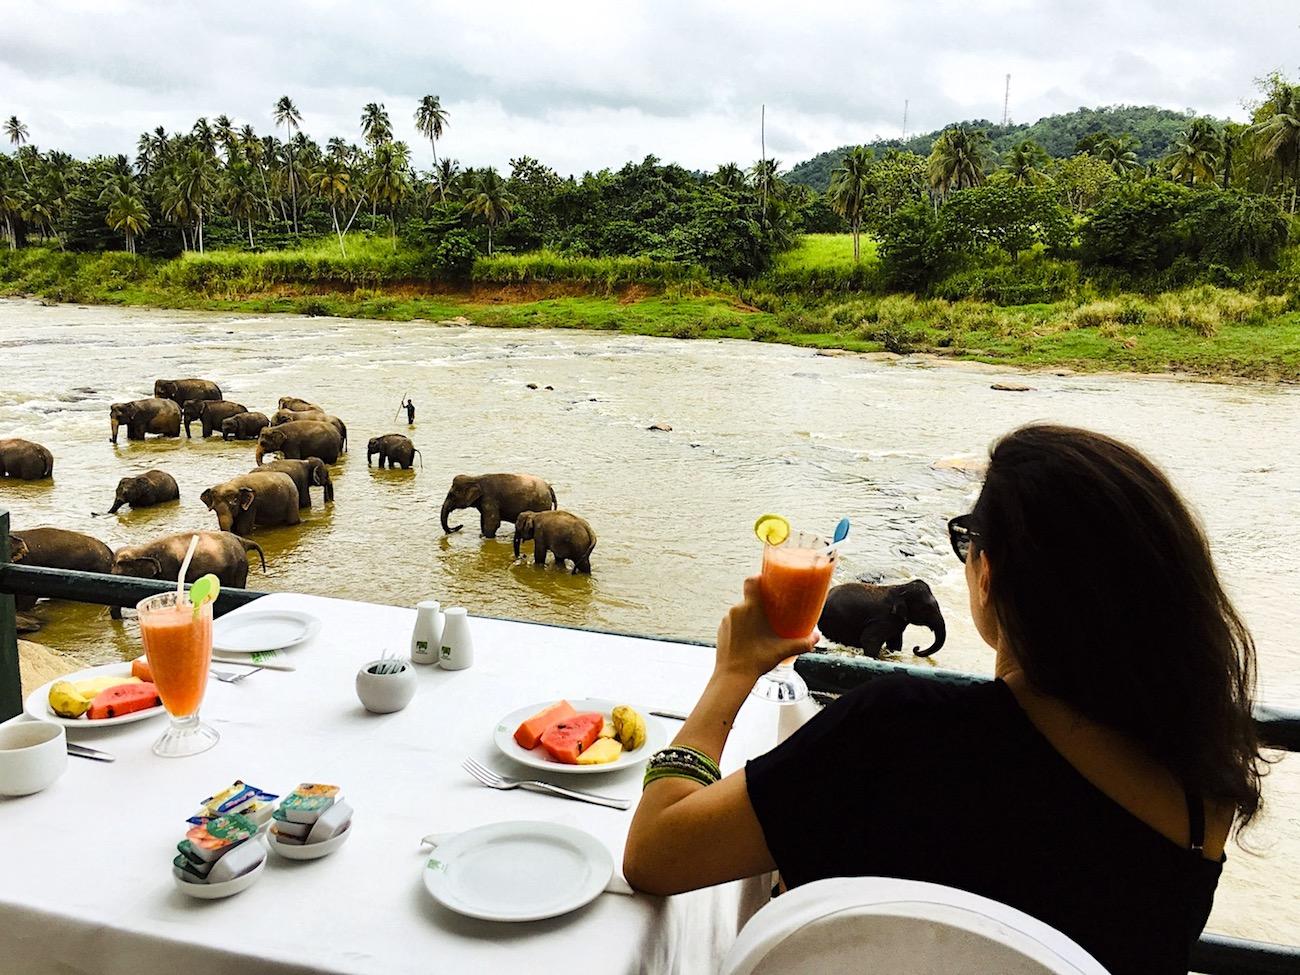 Vista do Maha Oya river, Sri Lanka. Foto: David Mattatia